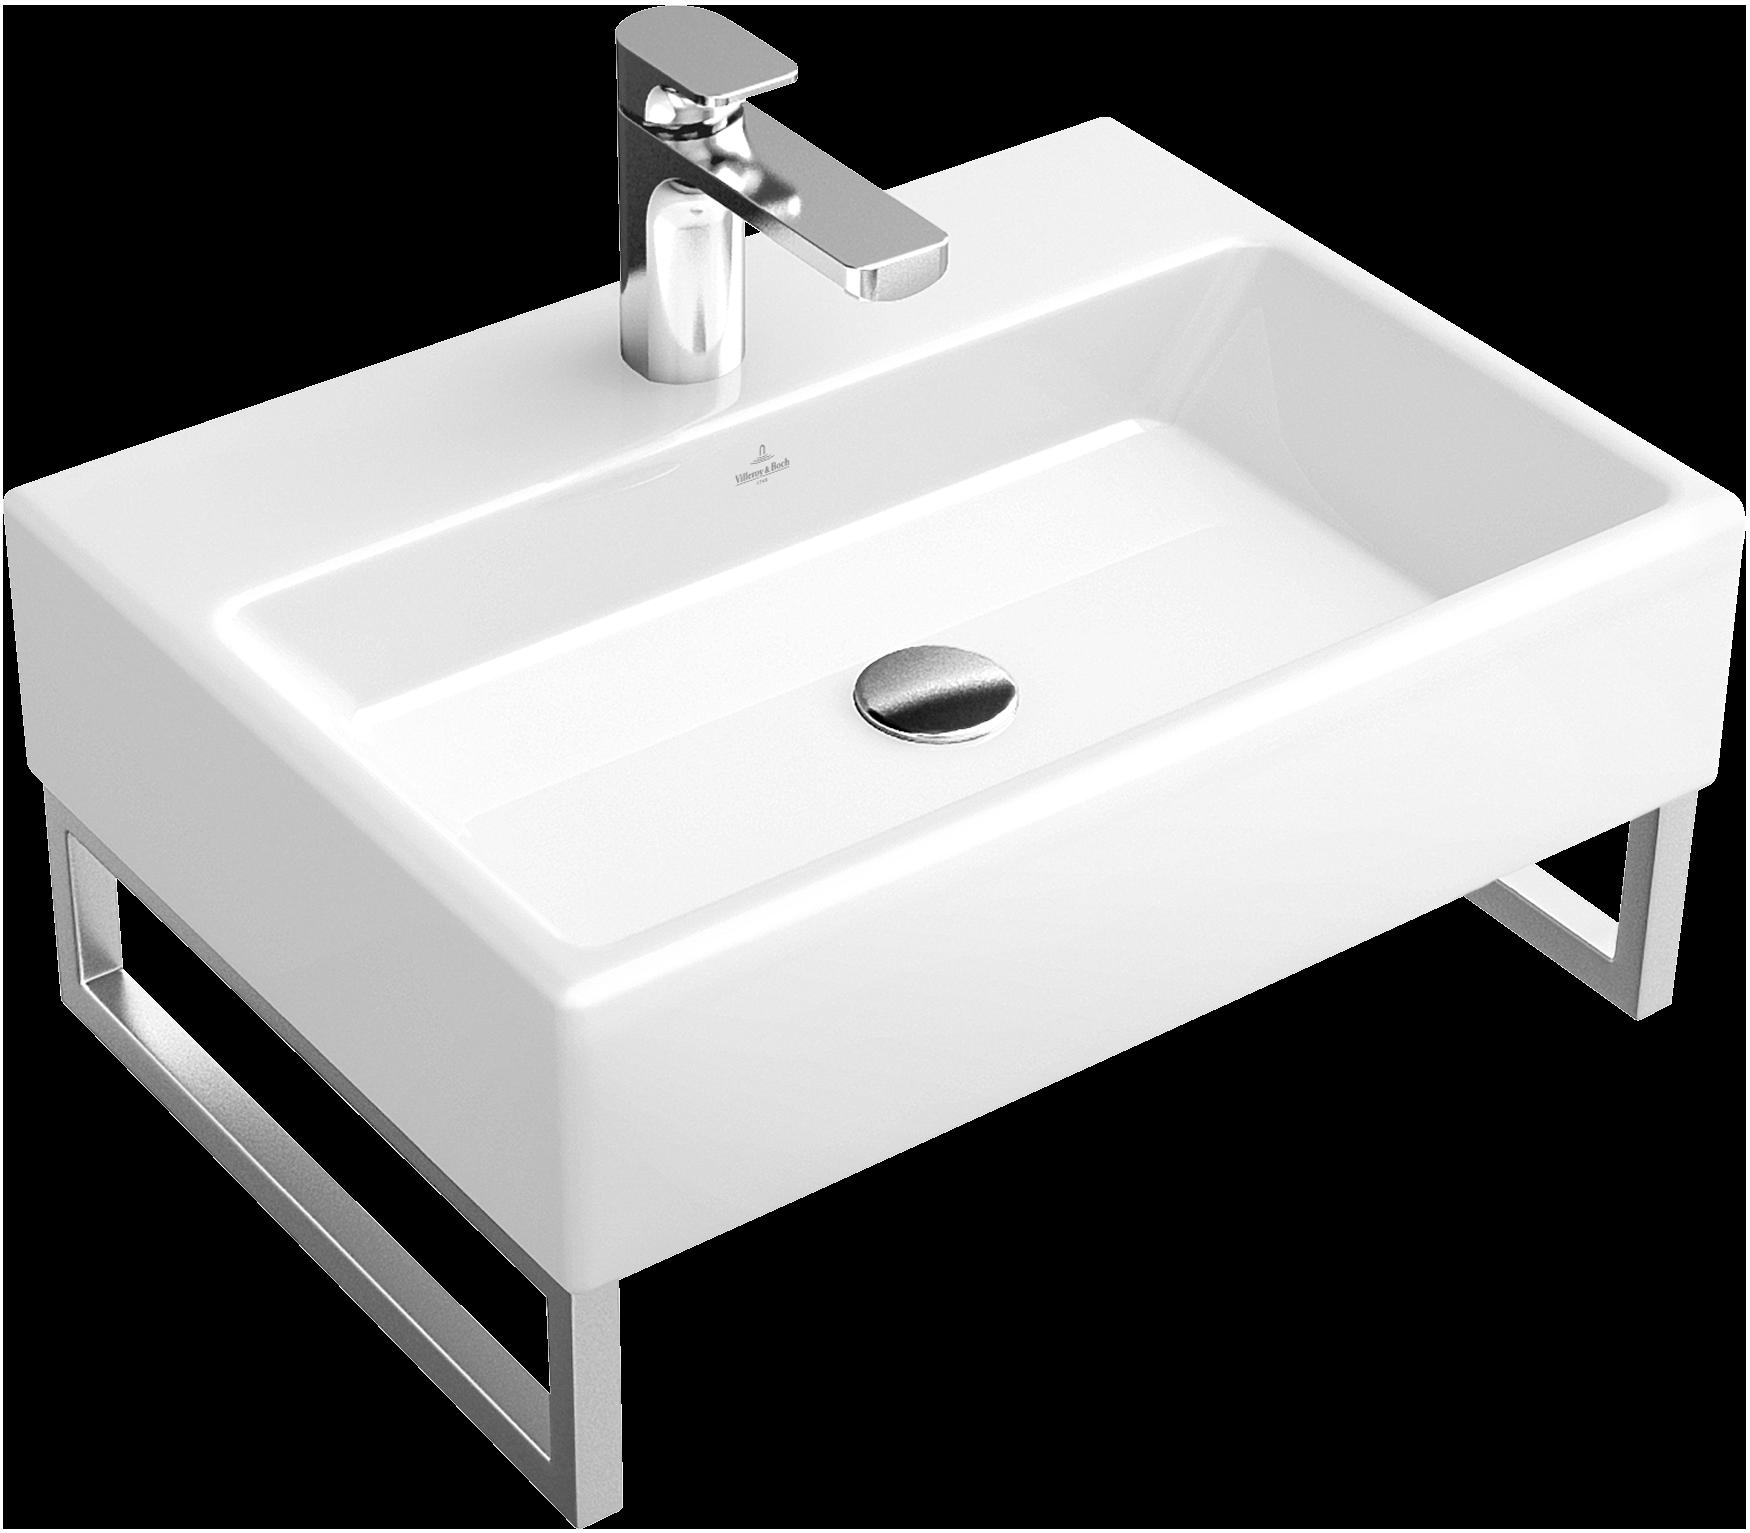 memento handtuchhalter 874937 villeroy boch. Black Bedroom Furniture Sets. Home Design Ideas